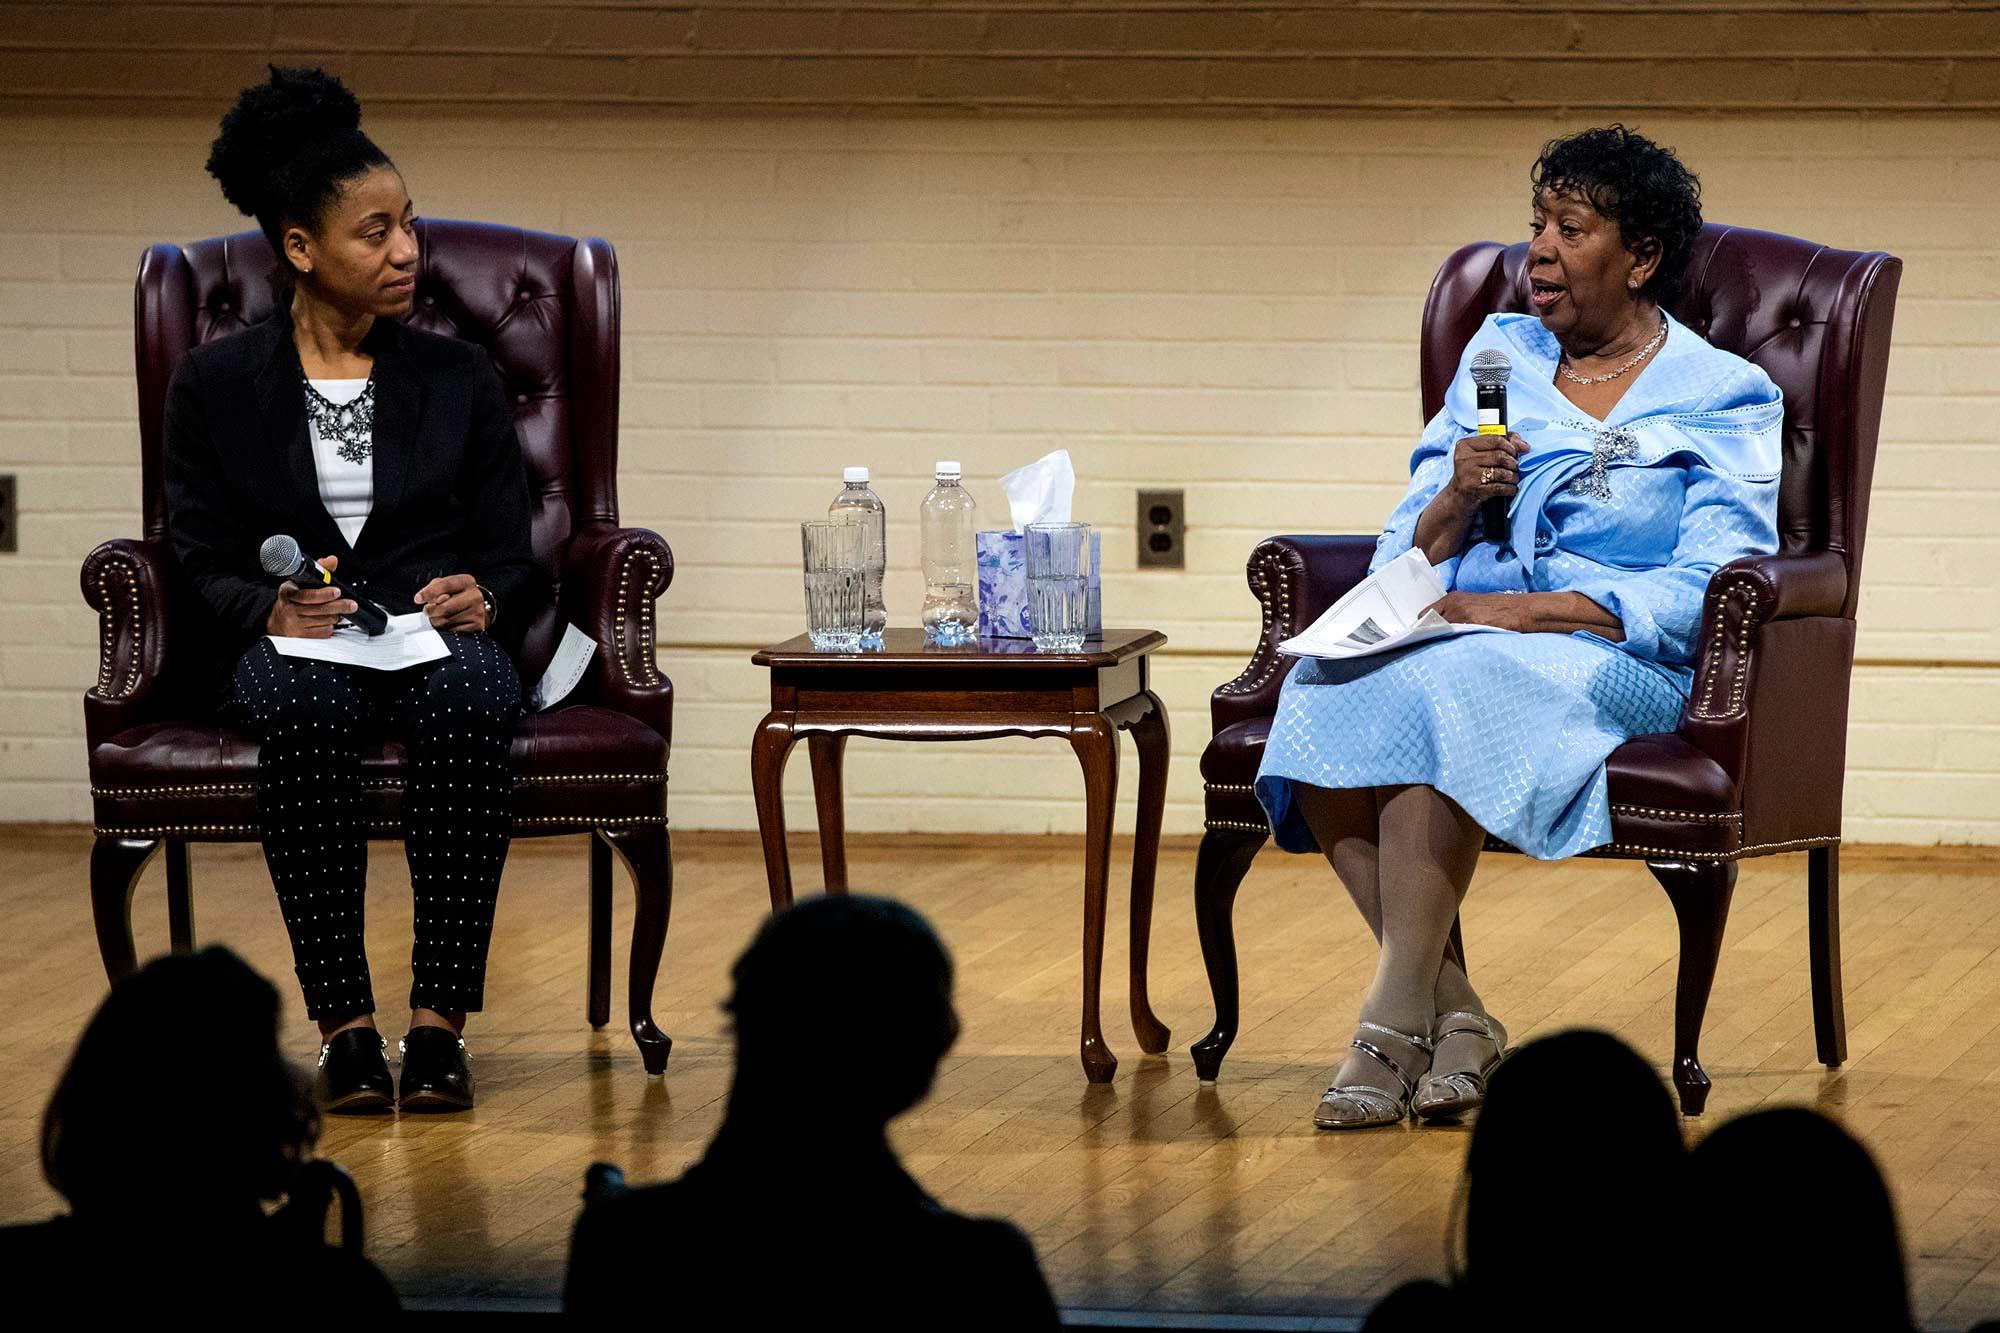 Nursing doctoral student Tori Tucker interviews Mavis Claytor during Friday's event at the Nursing School's McLeoad Auditorium.